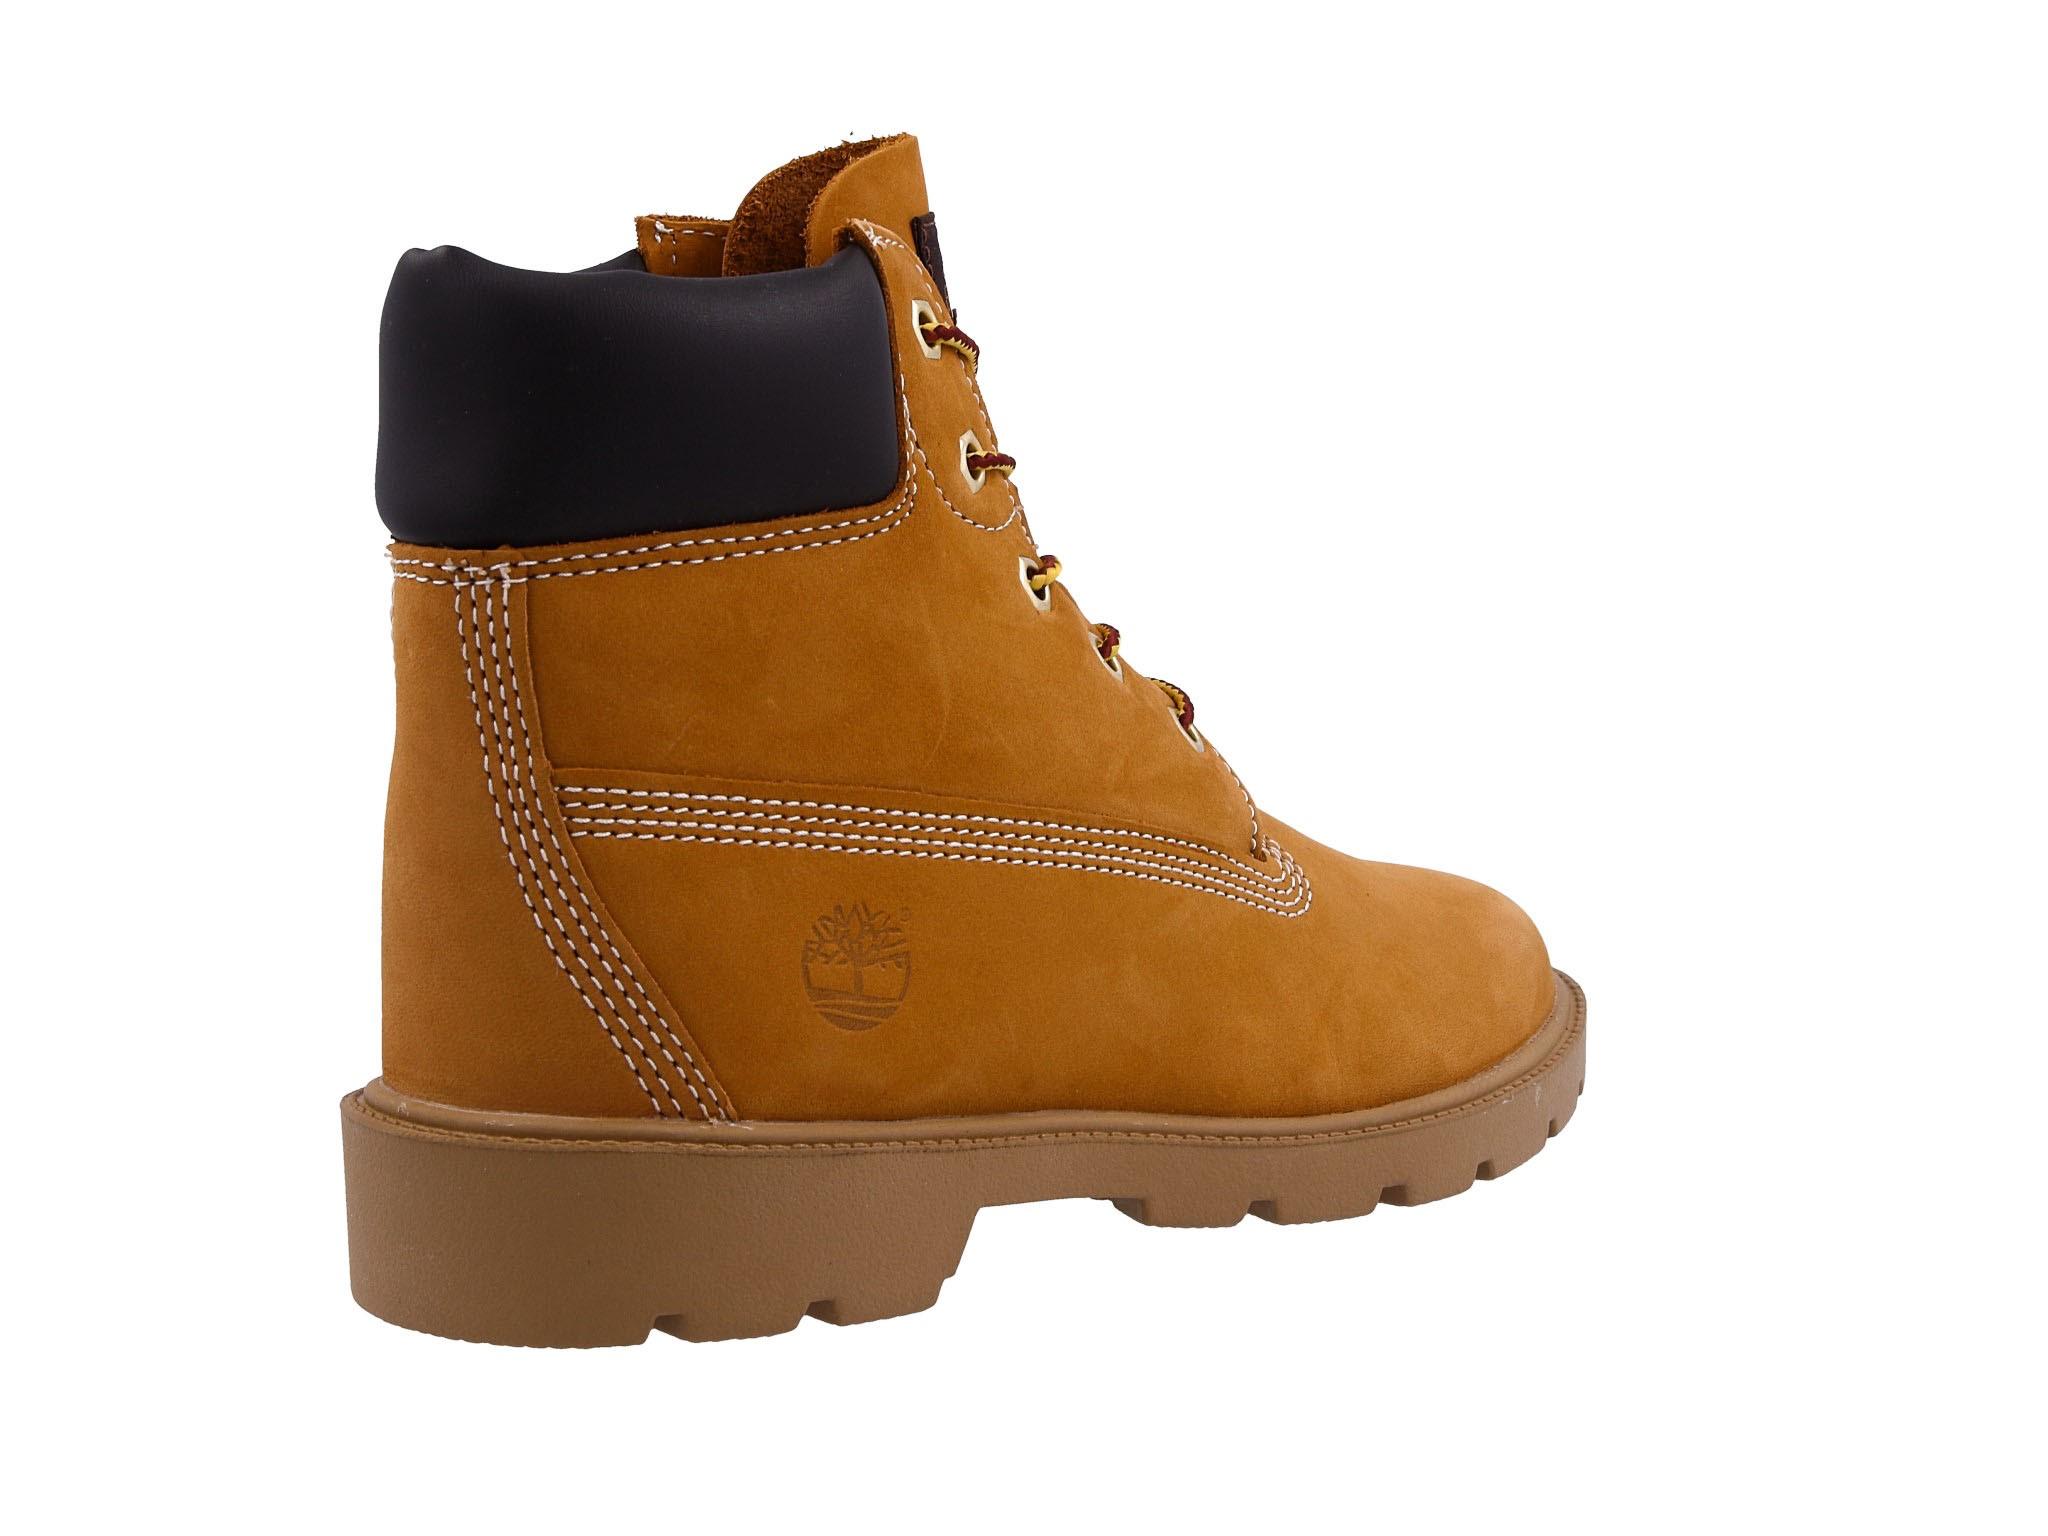 Bakancs TIMBERLAND Classic 6 In W Terproof Boot TB0109607131 Wheat Nubuck